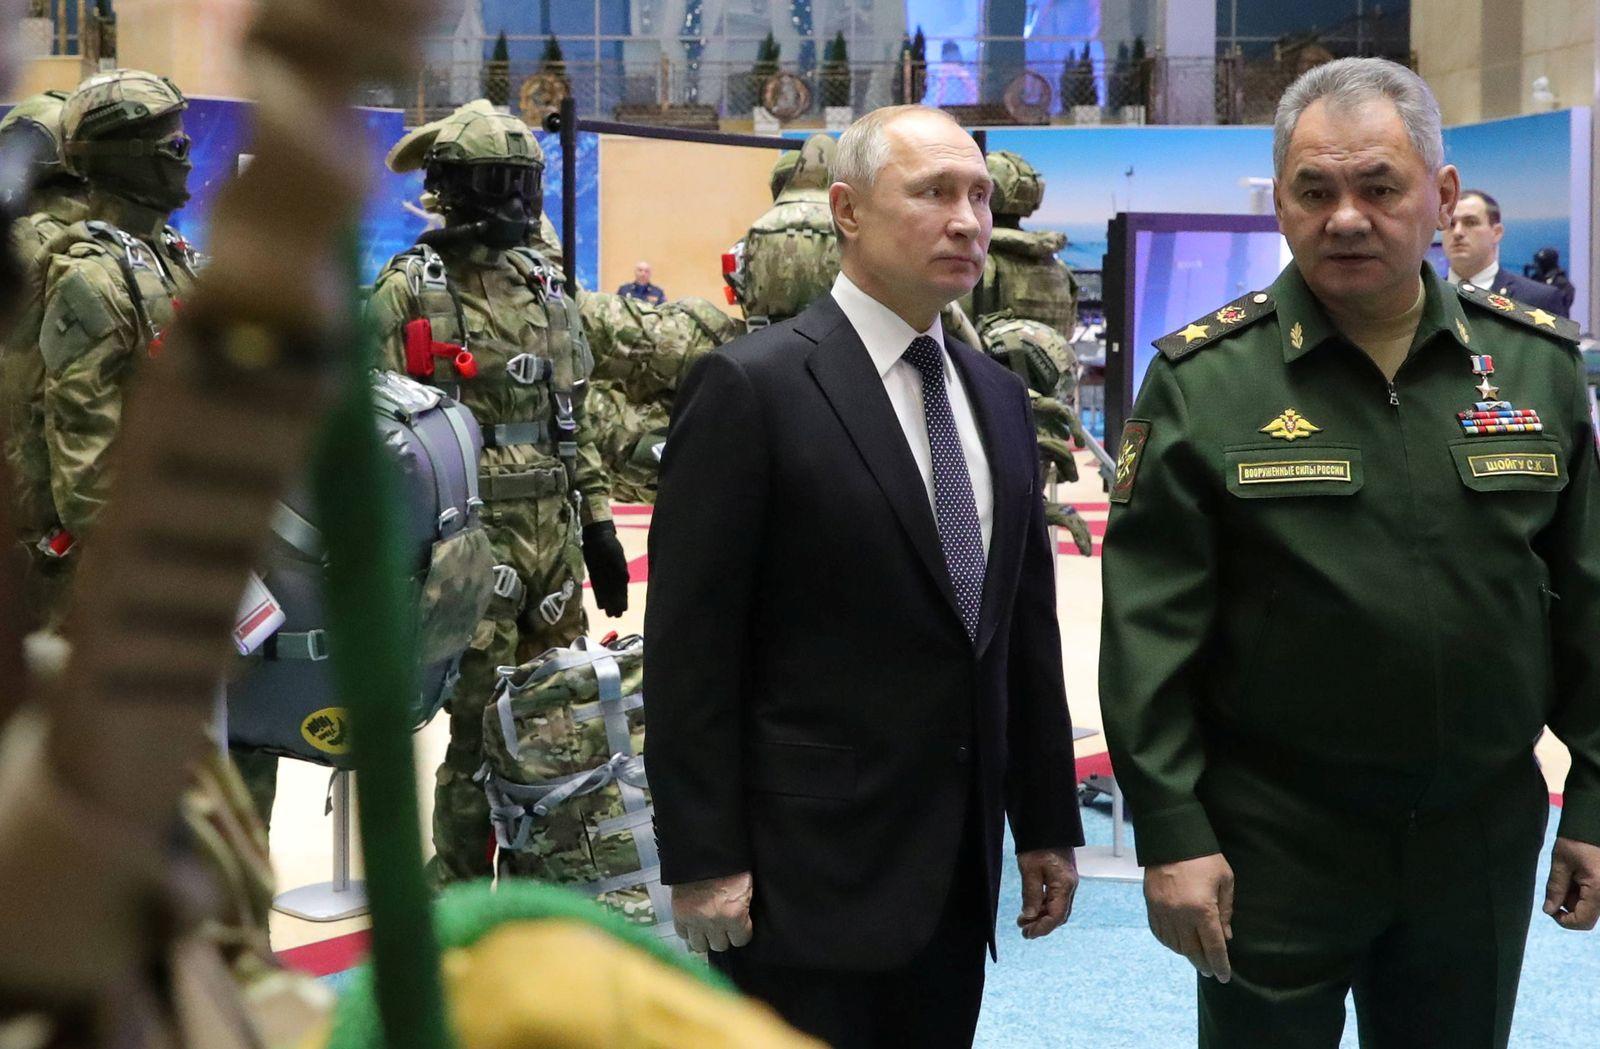 RUSSIA-PUTIN/DEFENCE